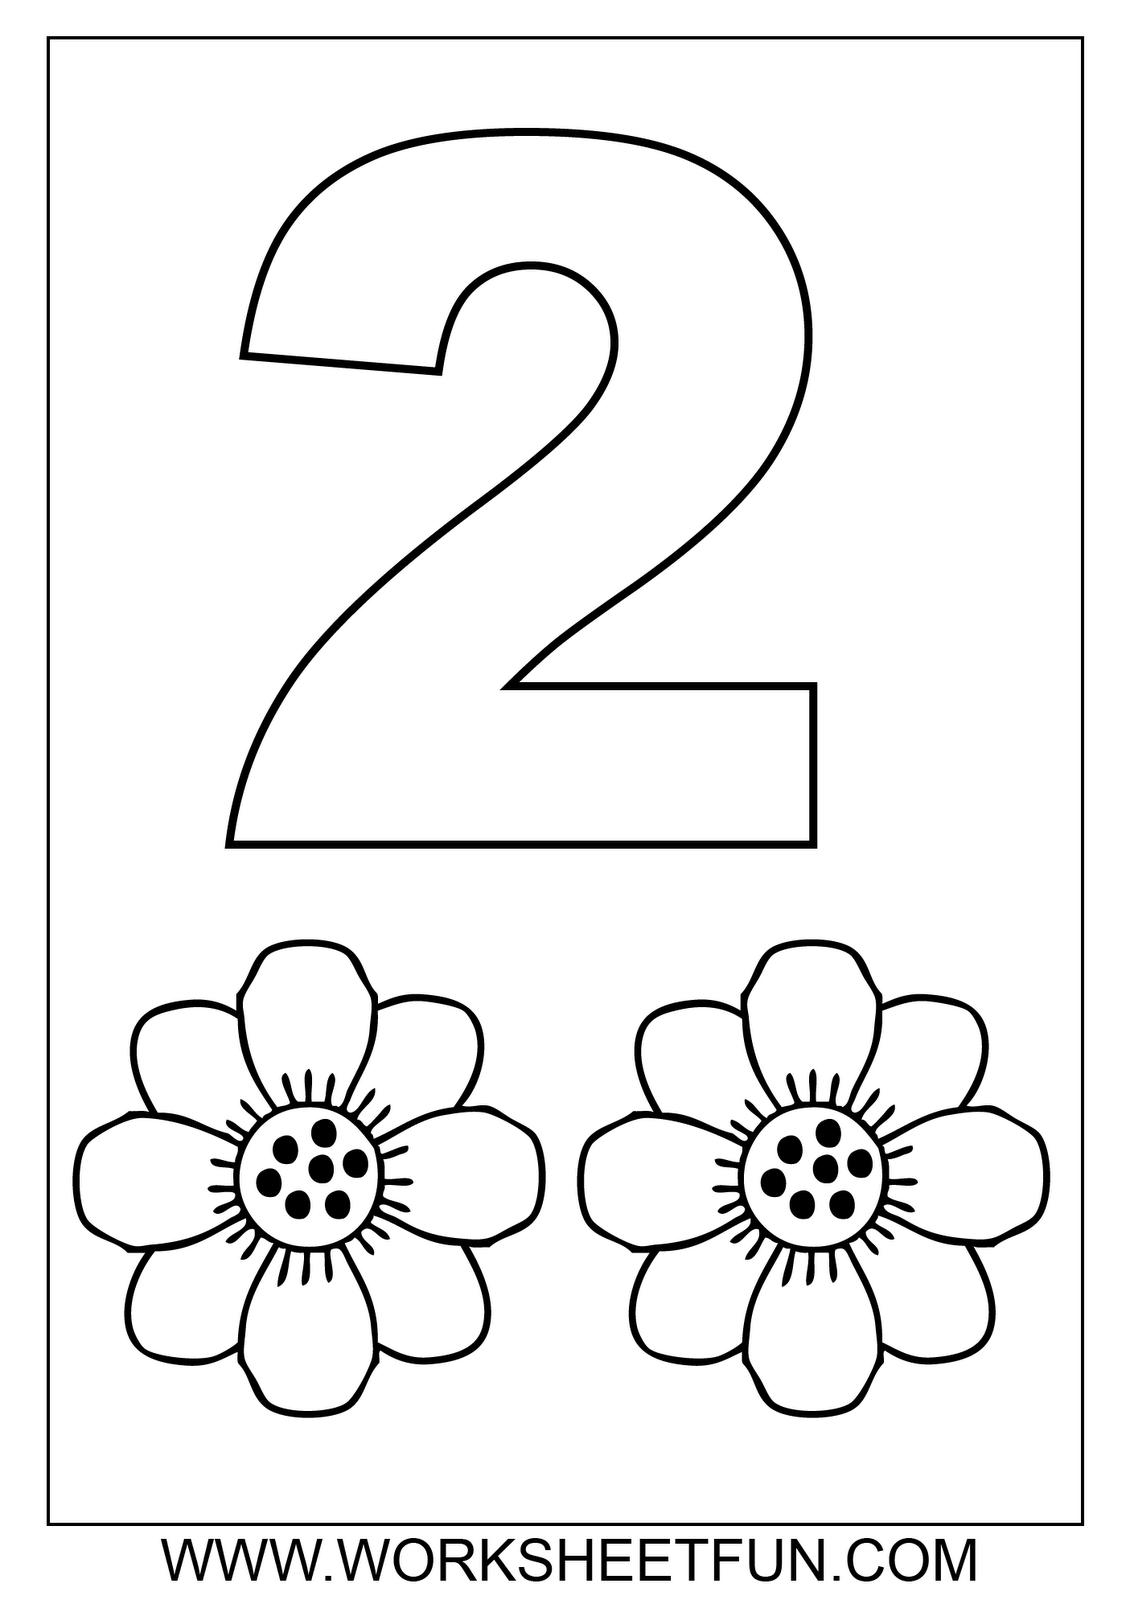 2 Worksheet For Kindergarten